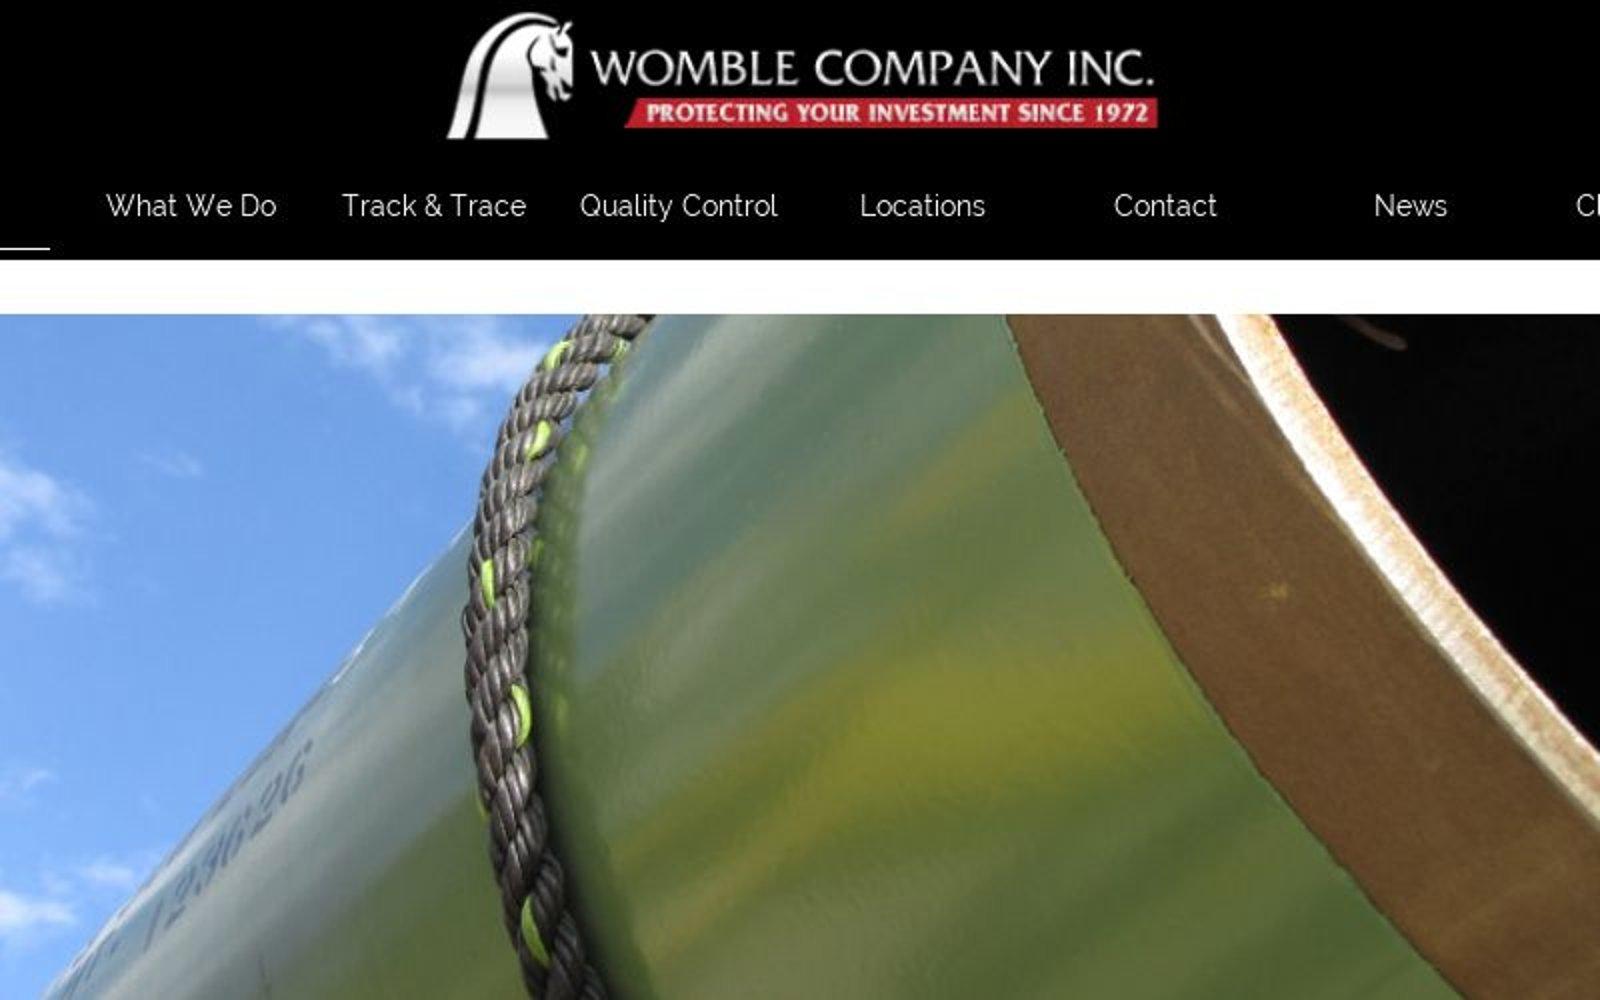 Womble Company, Inc  - What We Do